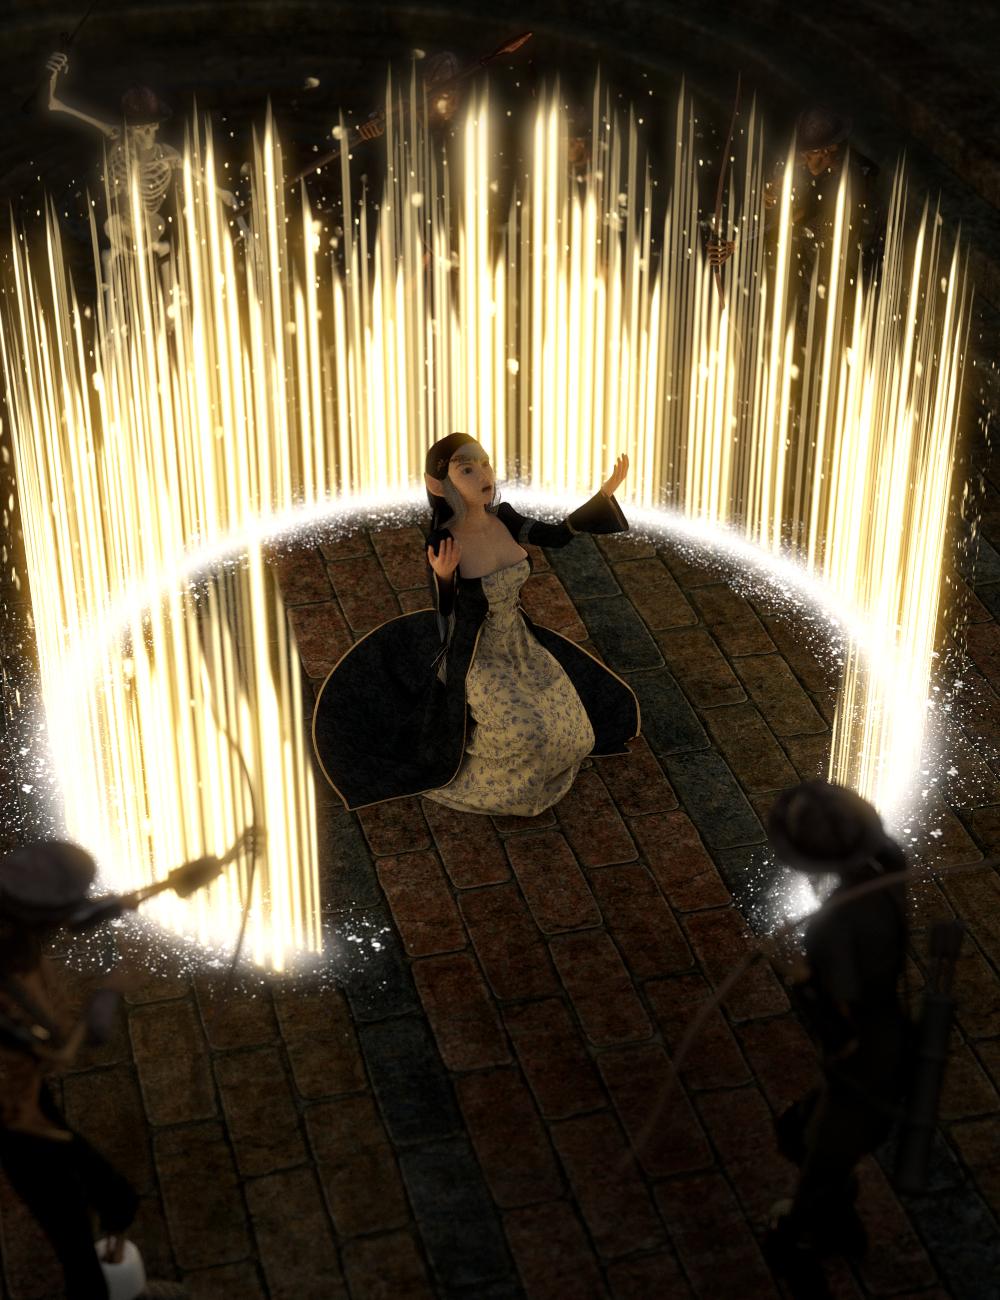 SY Magnificent Magic Genesis 8 by: Sickleyield, 3D Models by Daz 3D